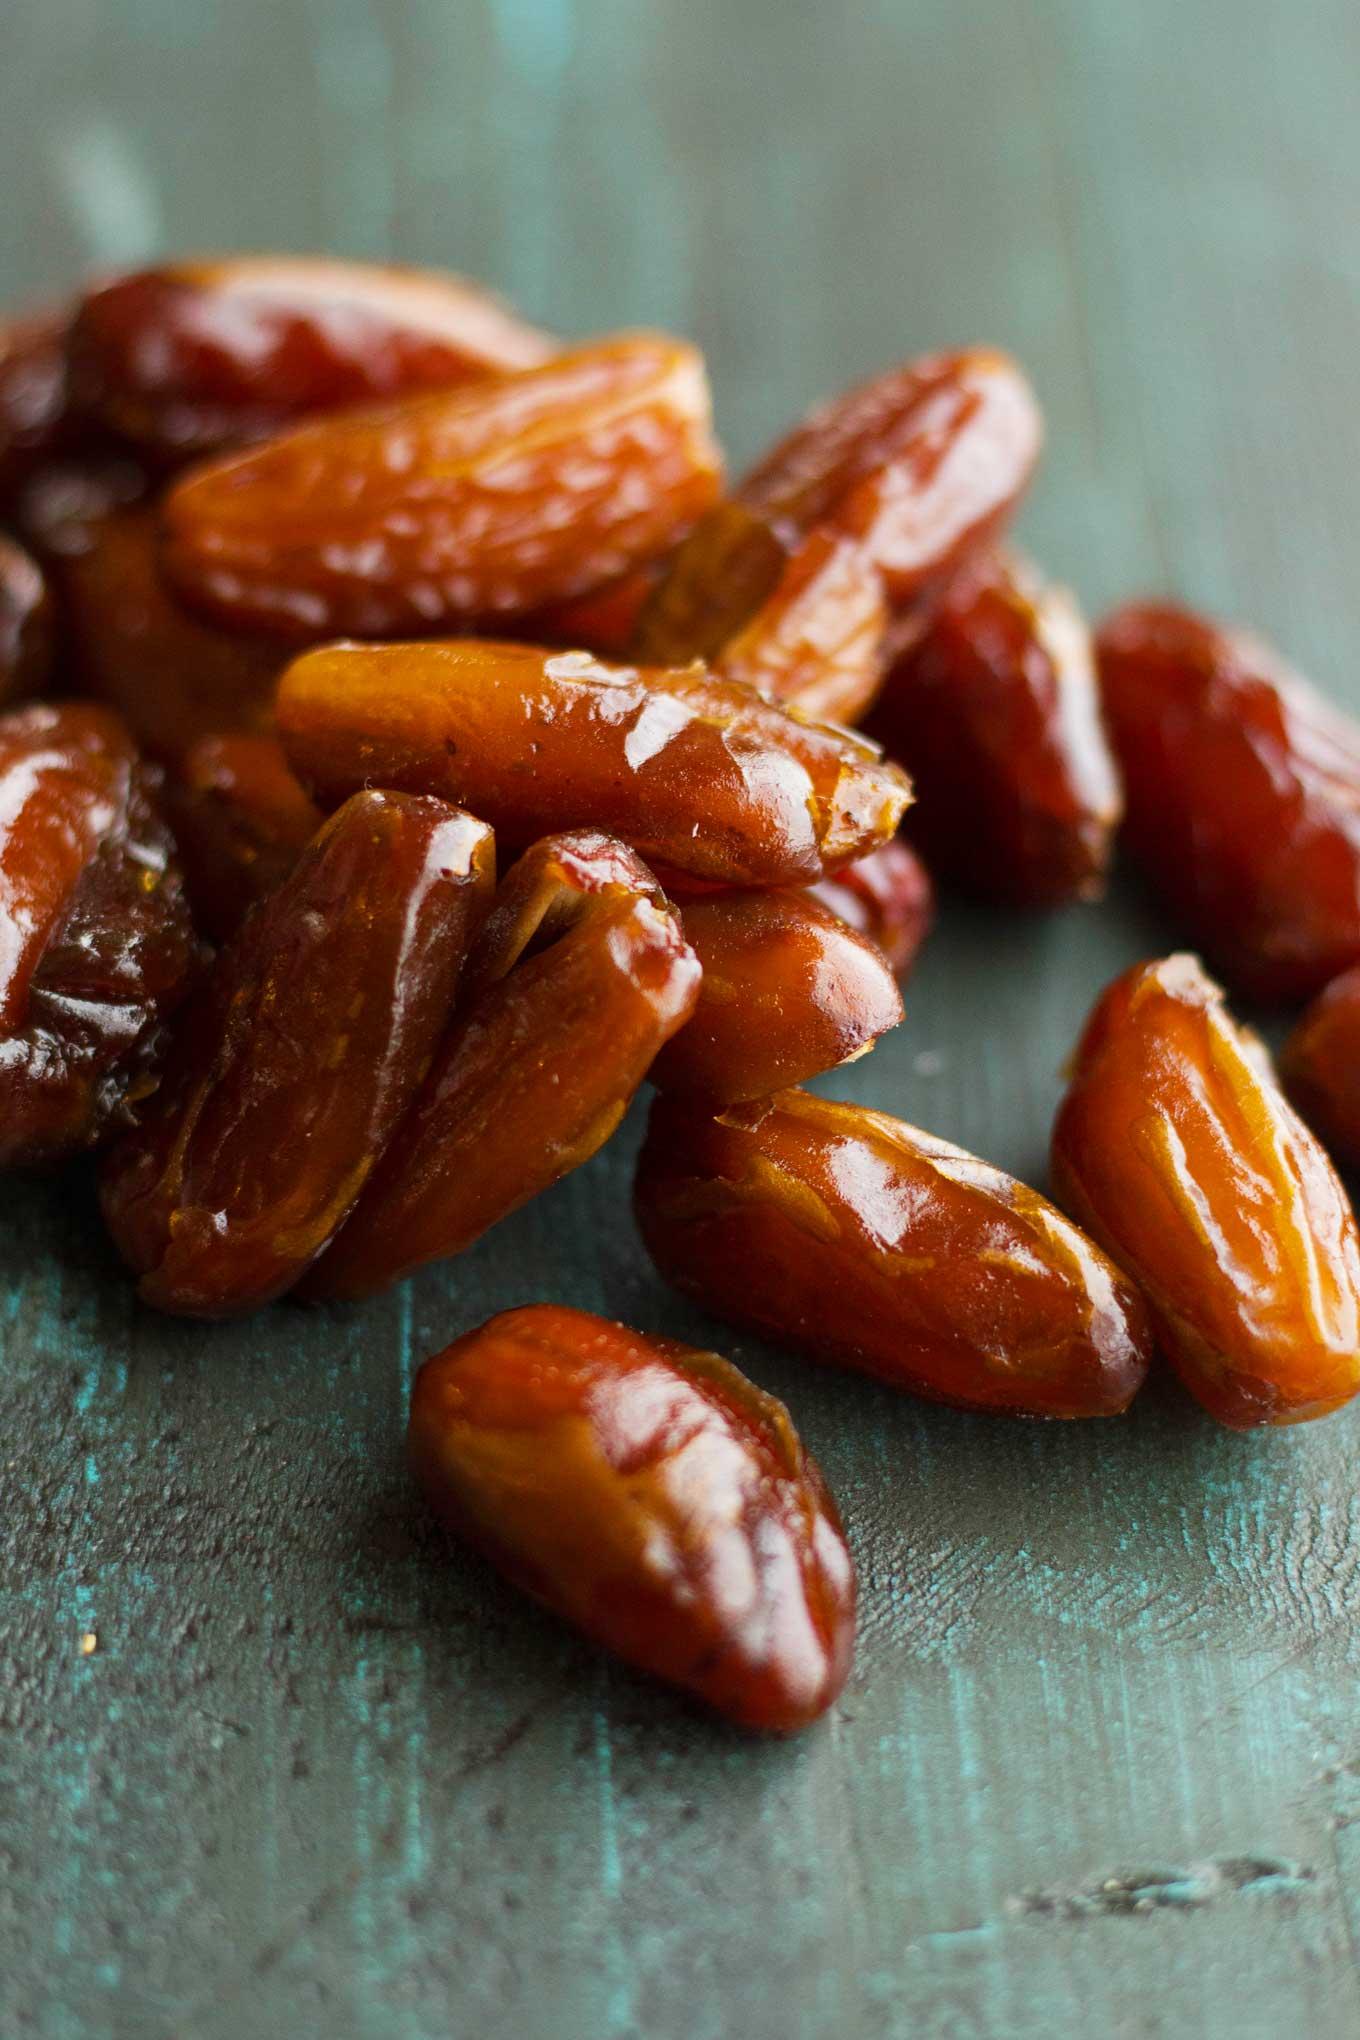 Date-Sweetened Teriyaki Sauce | Sugar-free | Vegan | Plant-based | Oil-Free | Gluten-Free | https://eatwithinyourmeans.com/